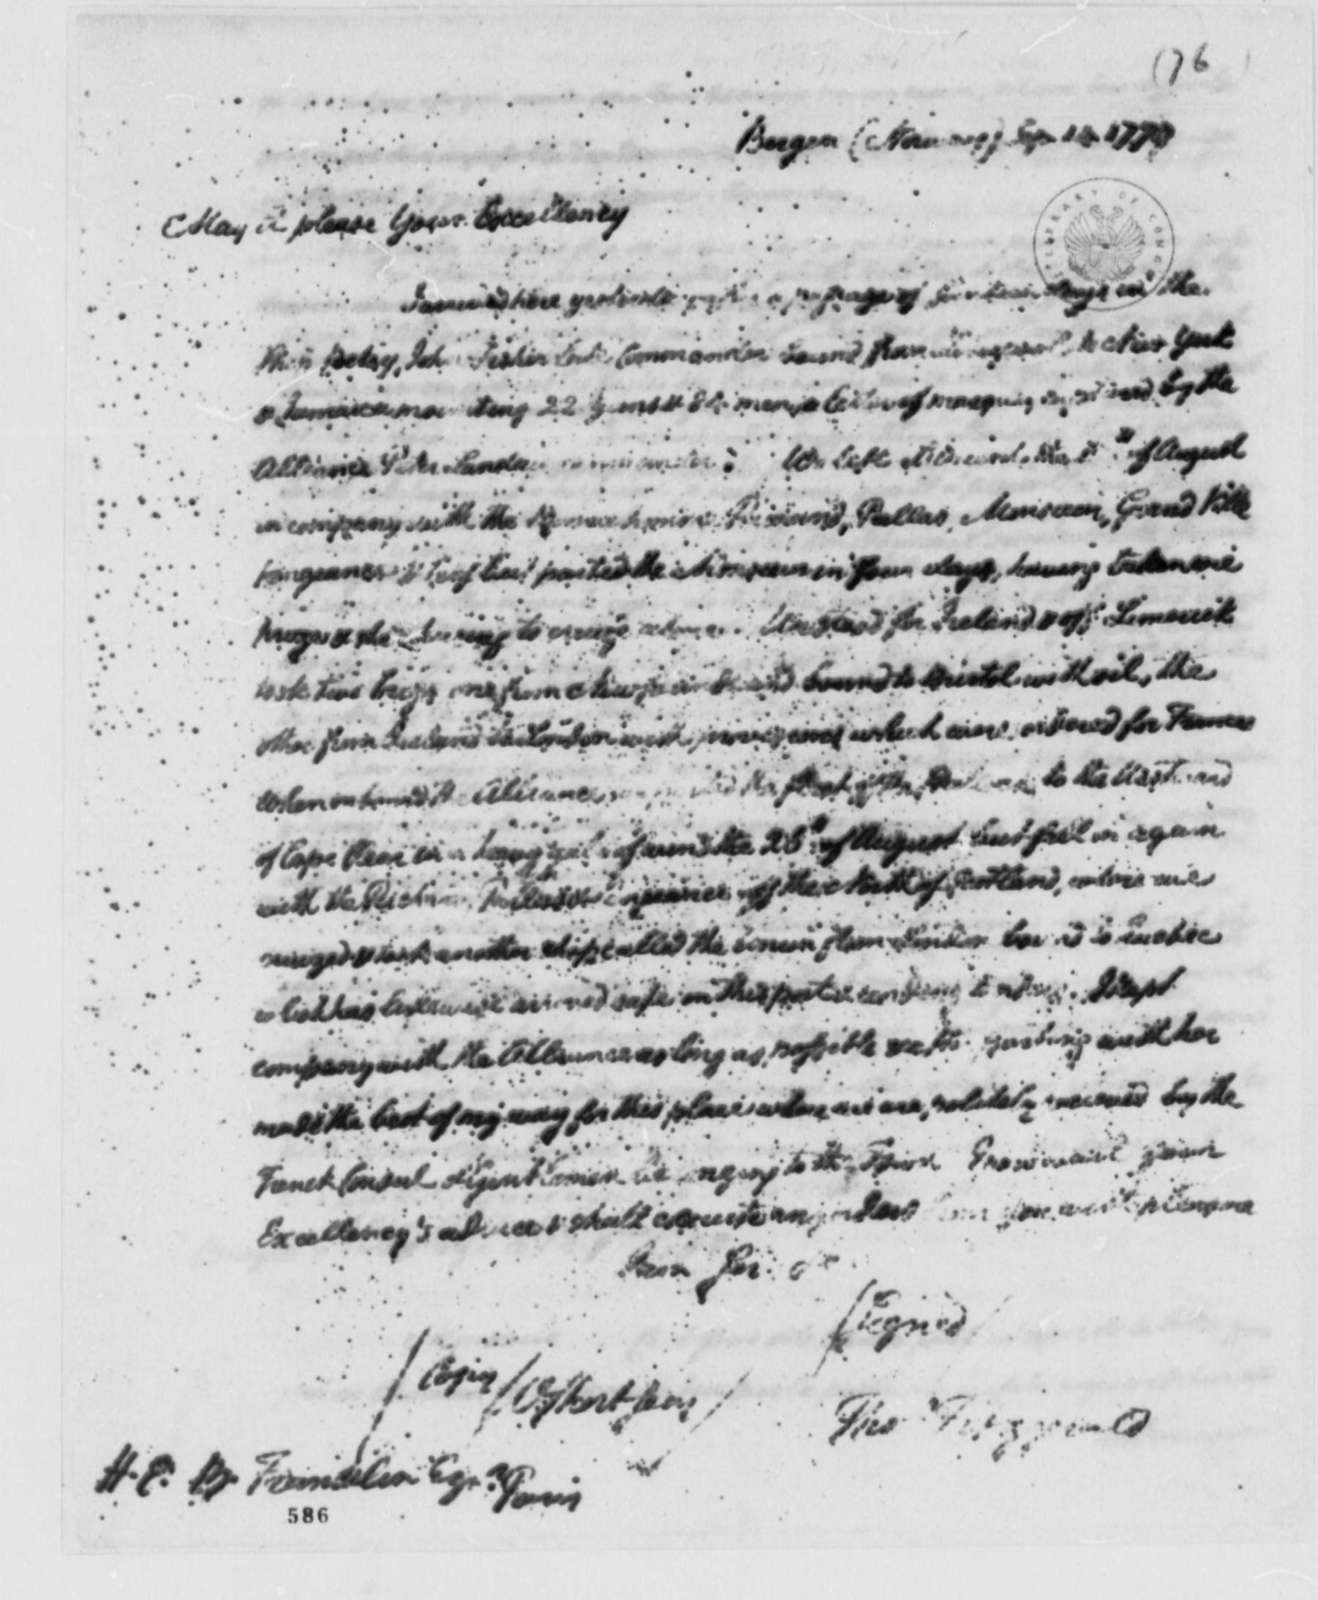 Thomas Fitzgerald to Benjamin Franklin, September 14, 1779